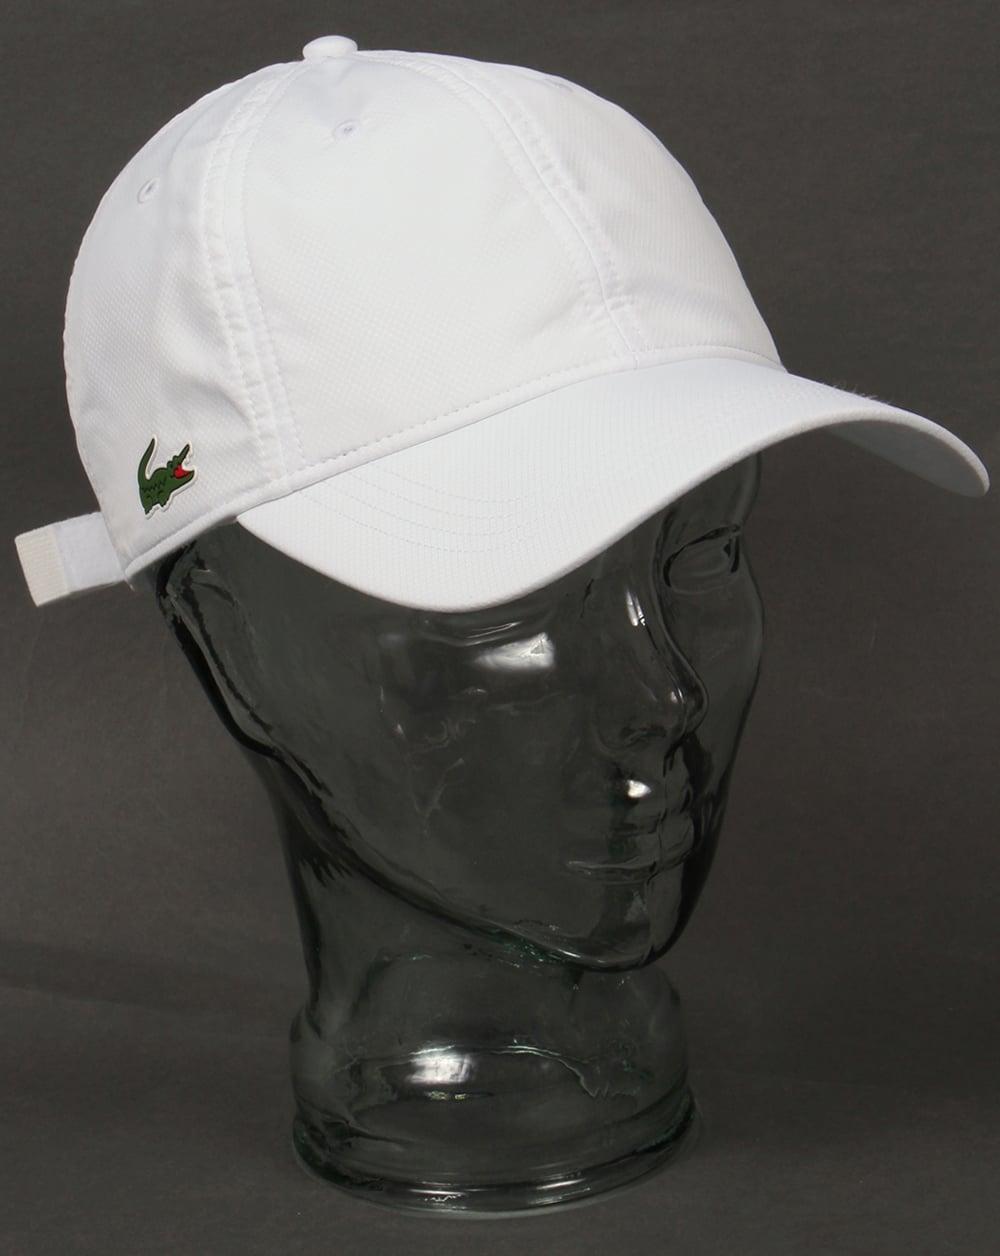 958cb40fb6c1 Lacoste Sport Cap White,baseball,mens